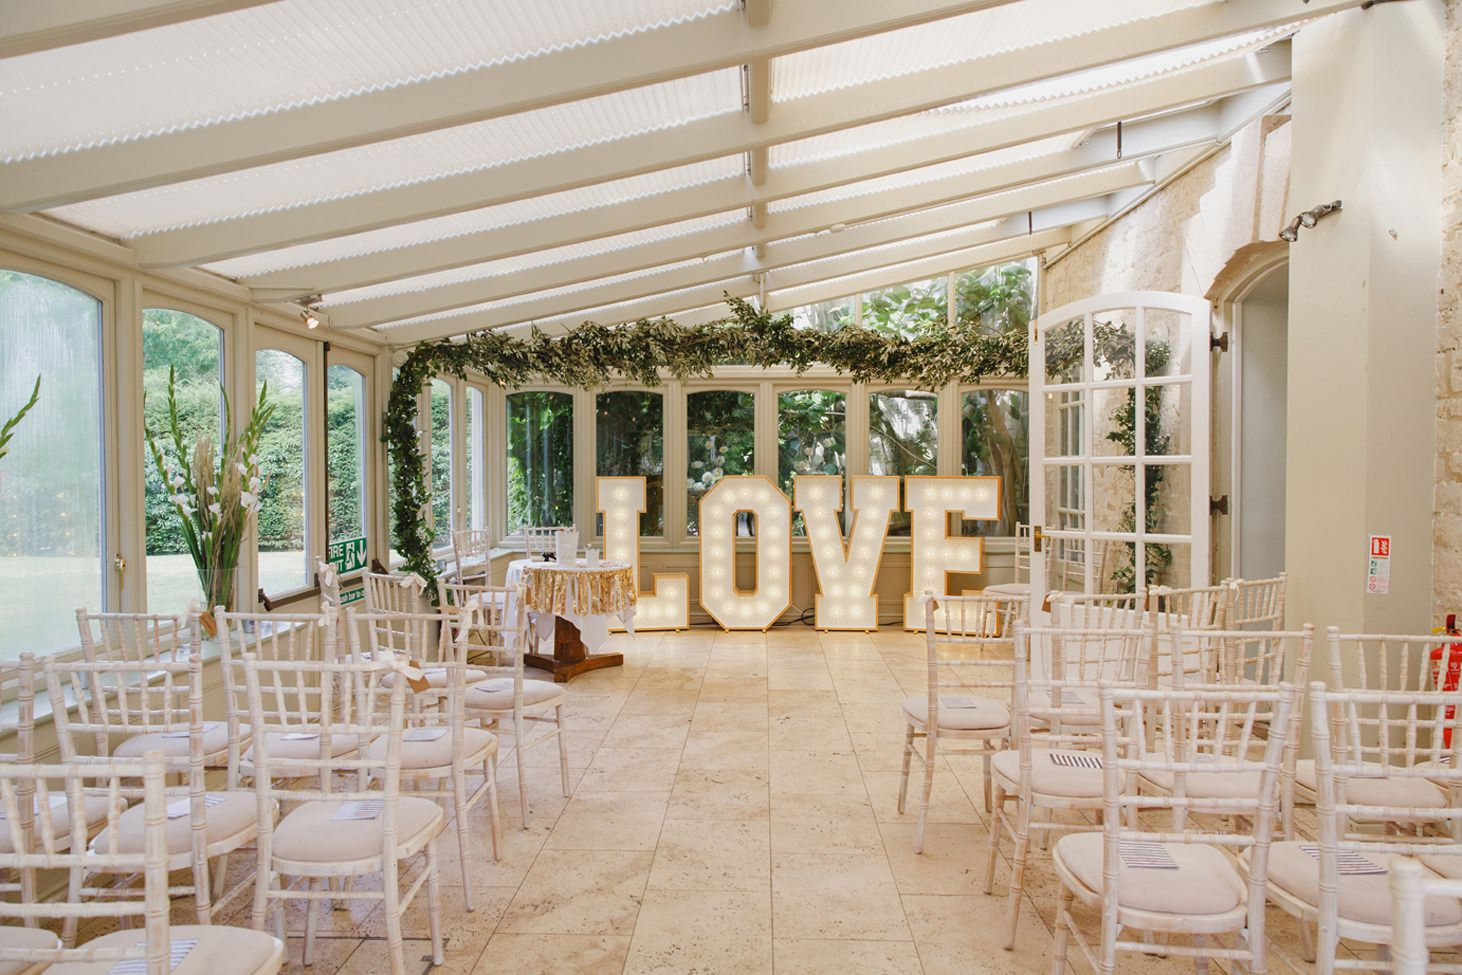 The Rectory Hotel wedding ceremony room